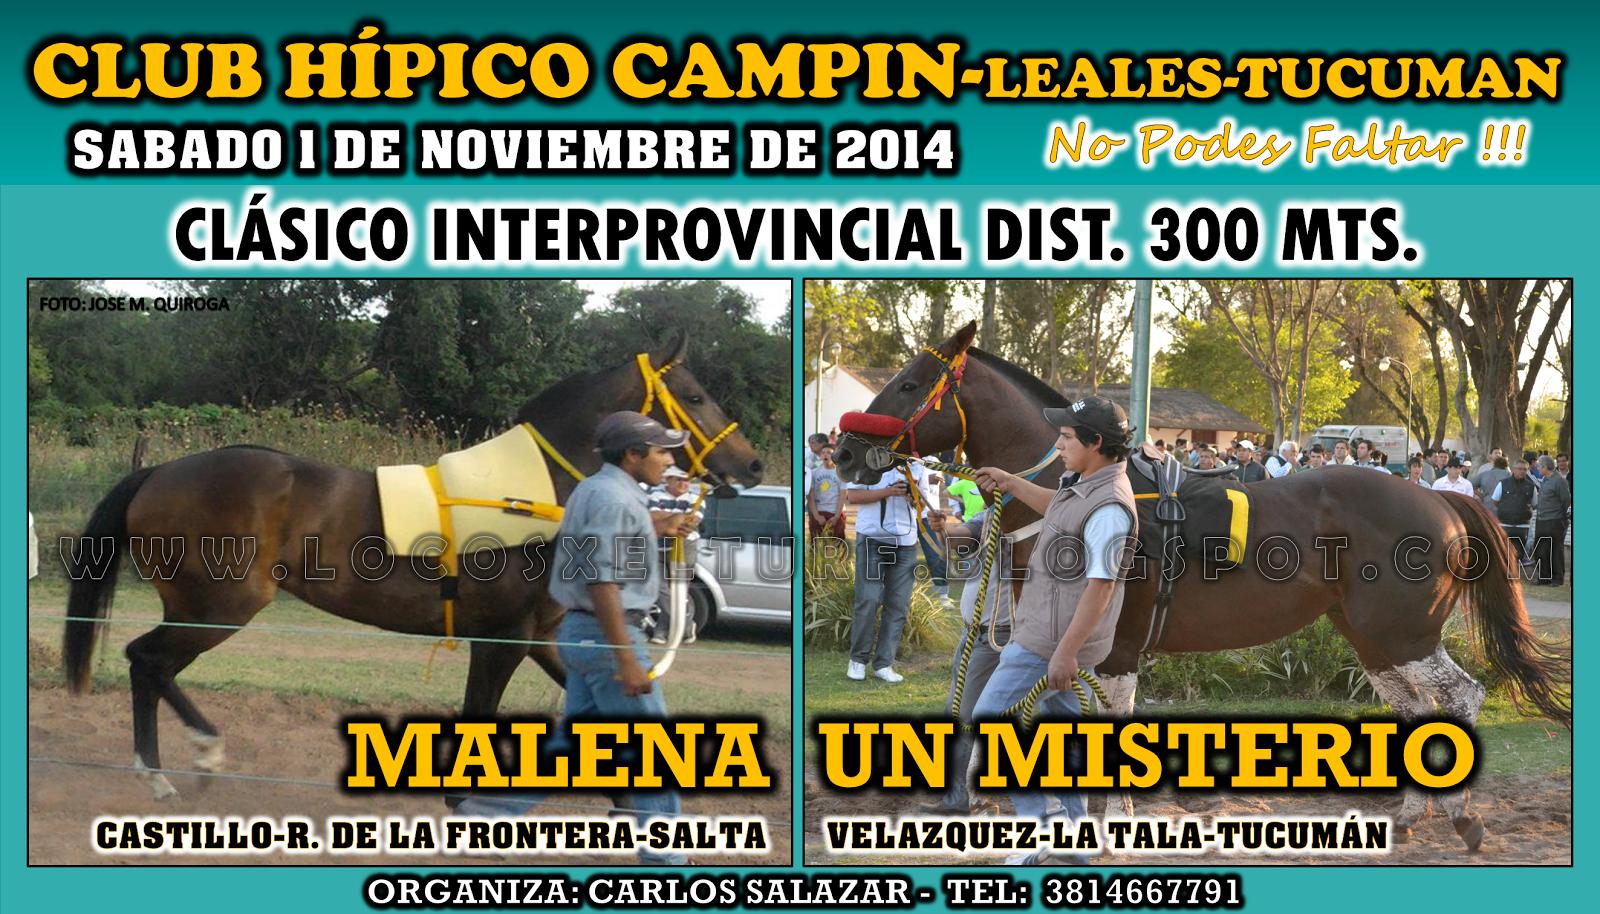 01-11-14-HIP. CAMPIN-2-CLAS.